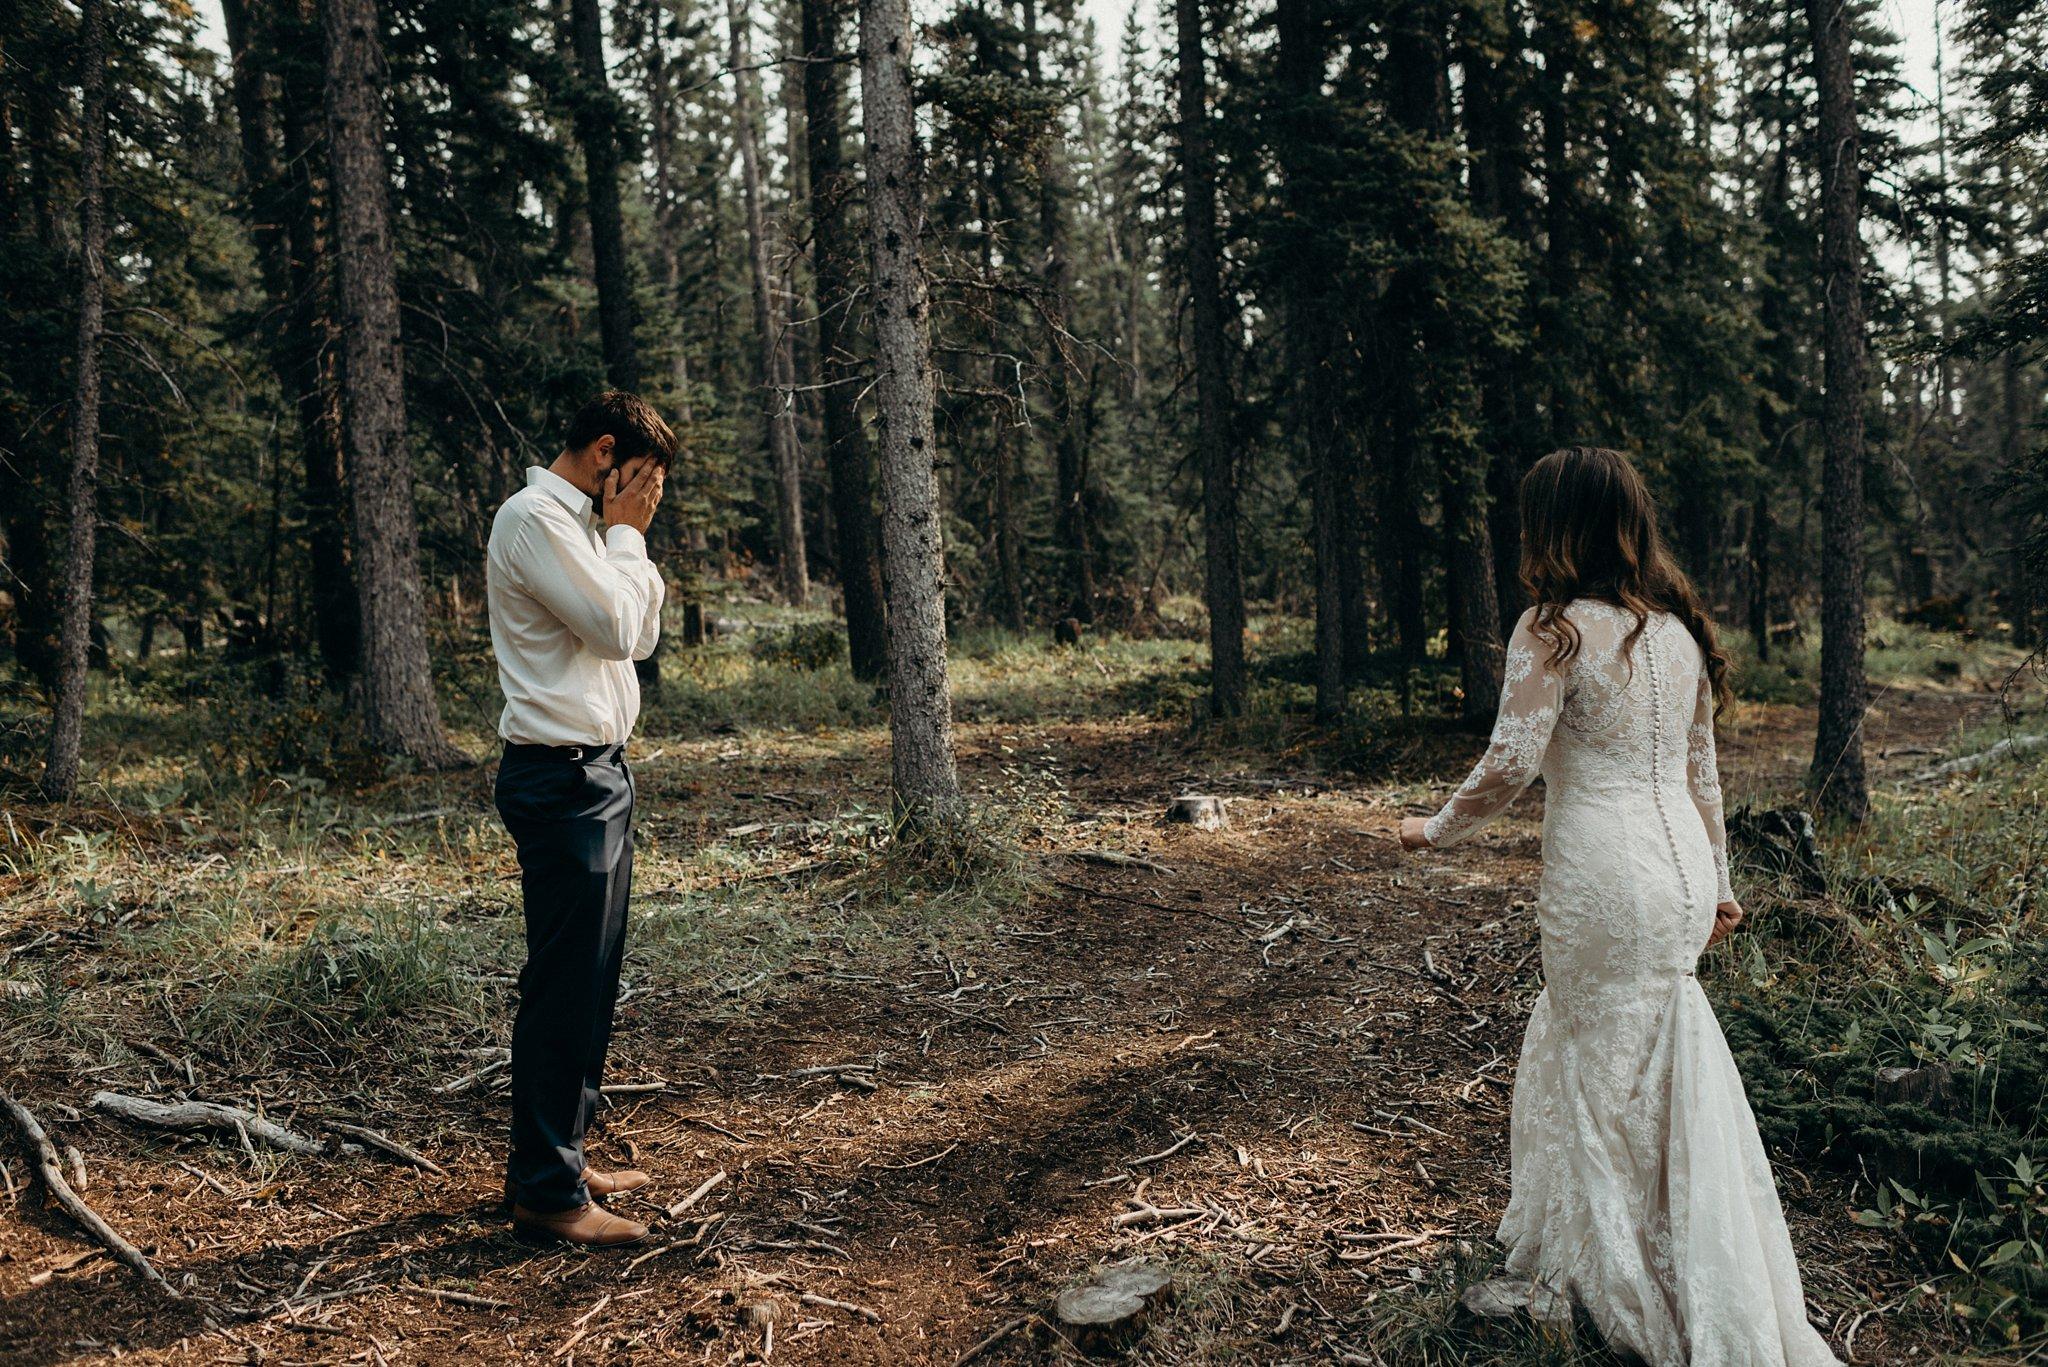 kaihla_tonai_intimate_wedding_elopement_photographer_6708.jpg